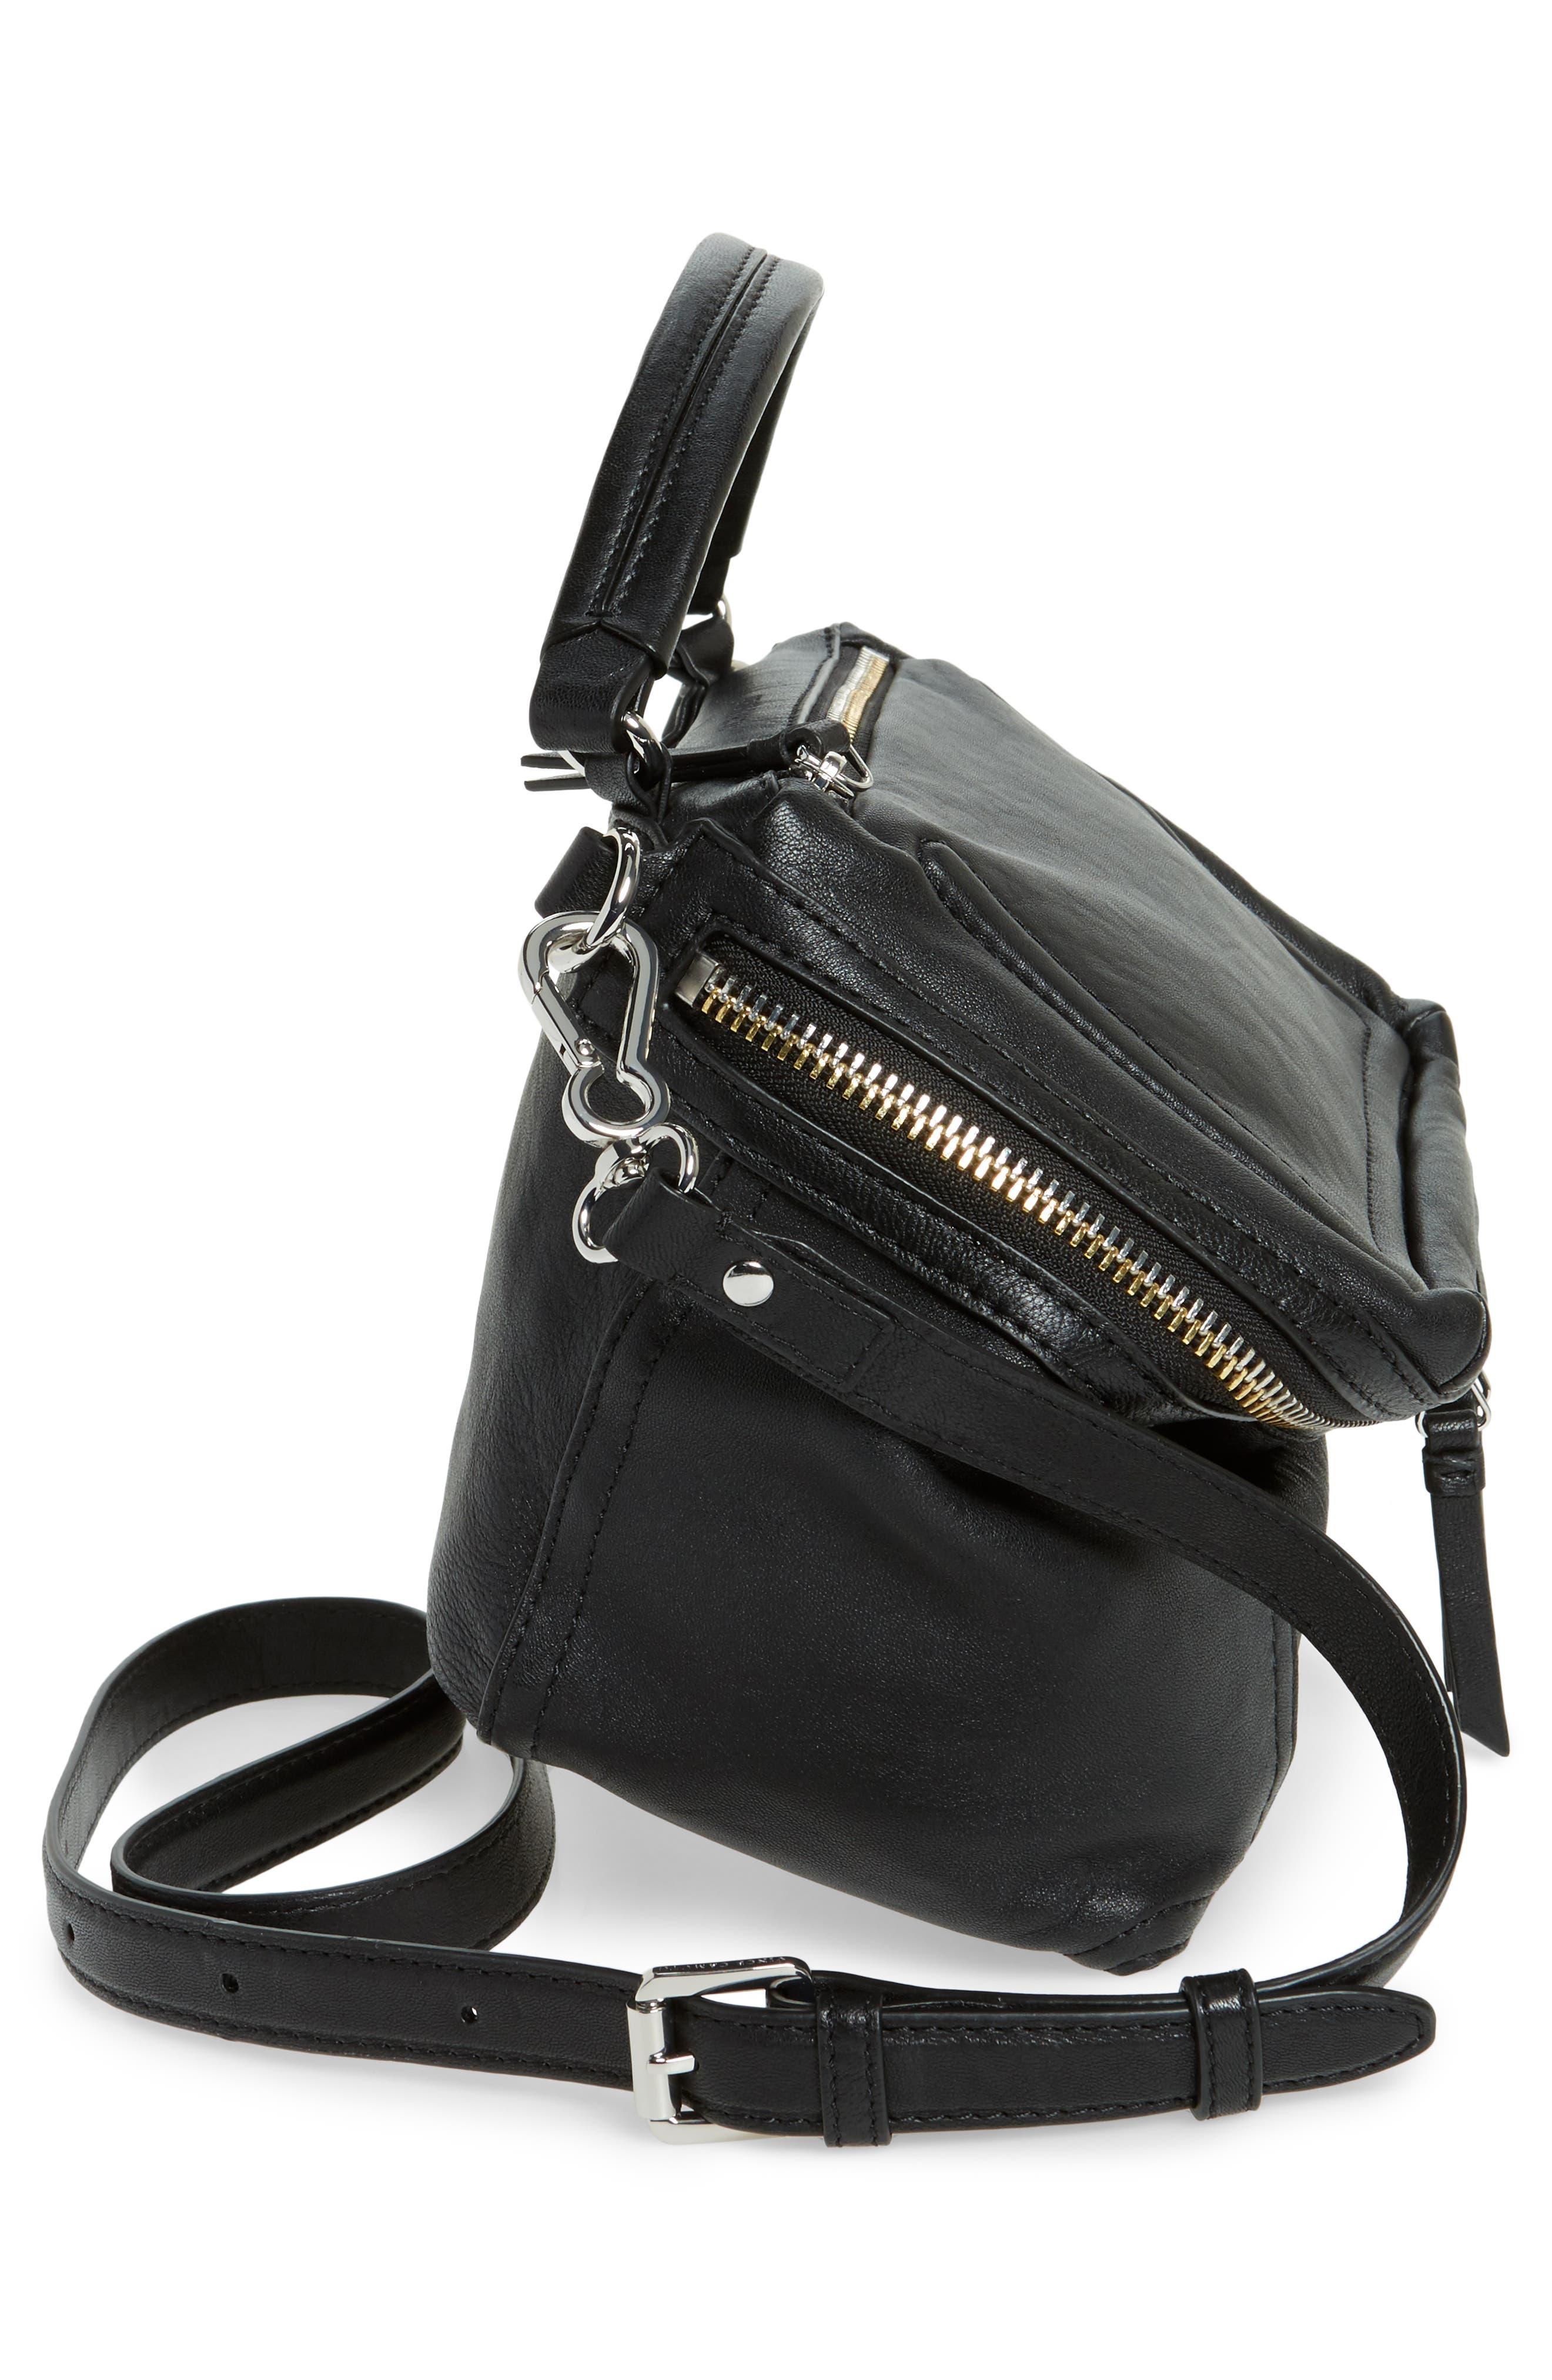 Medium Patch Leather Crossbody Bag,                             Alternate thumbnail 5, color,                             002